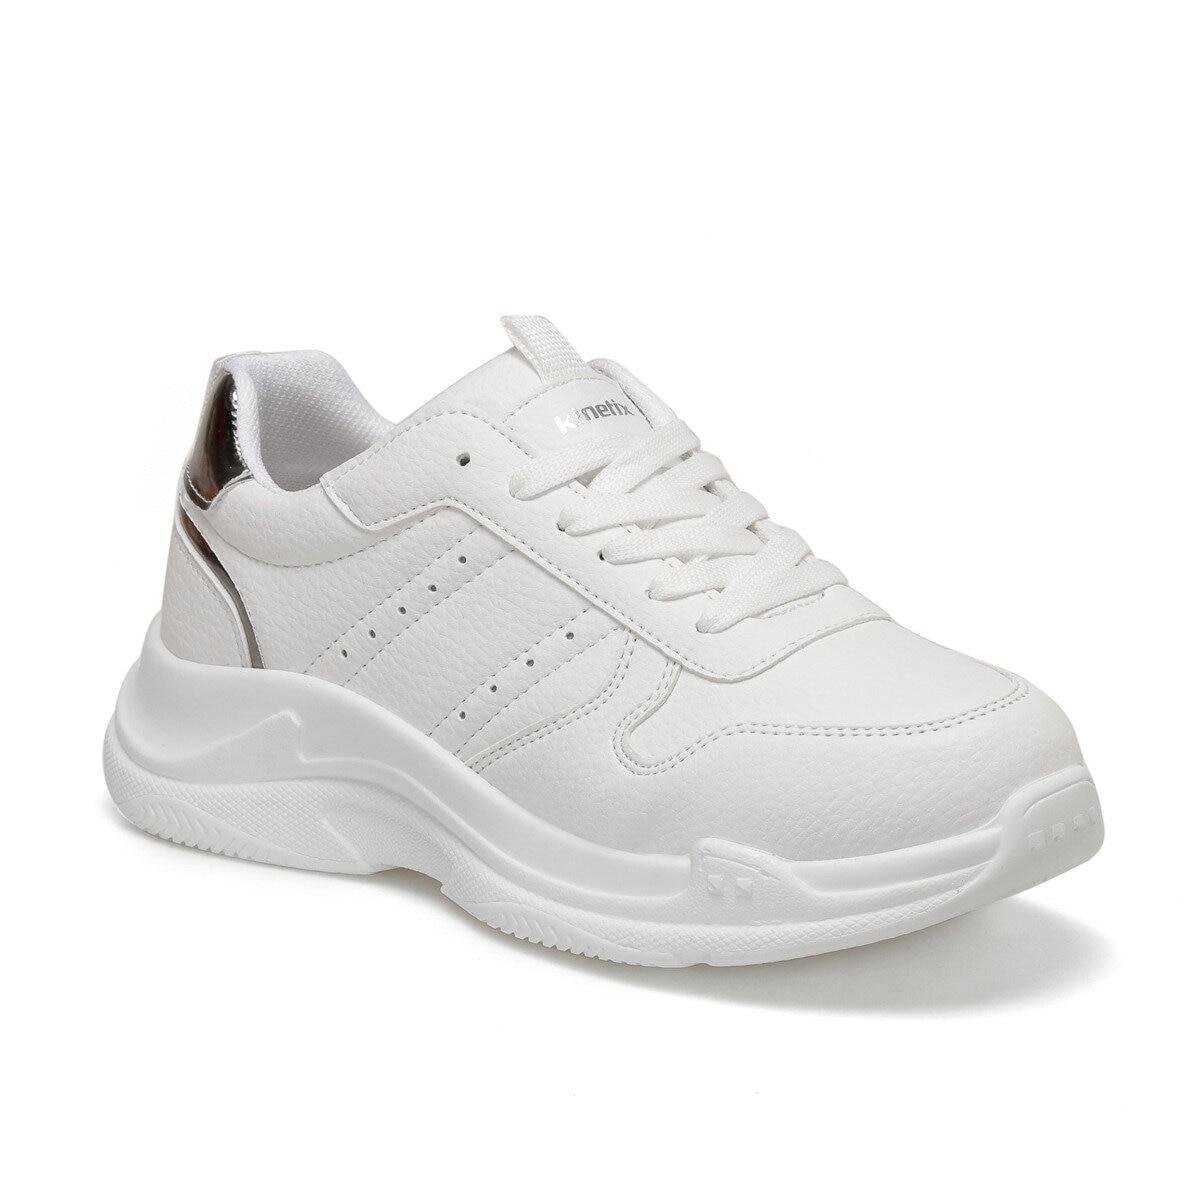 FLO PALEO White Women 'S Sports Shoes KINETIX